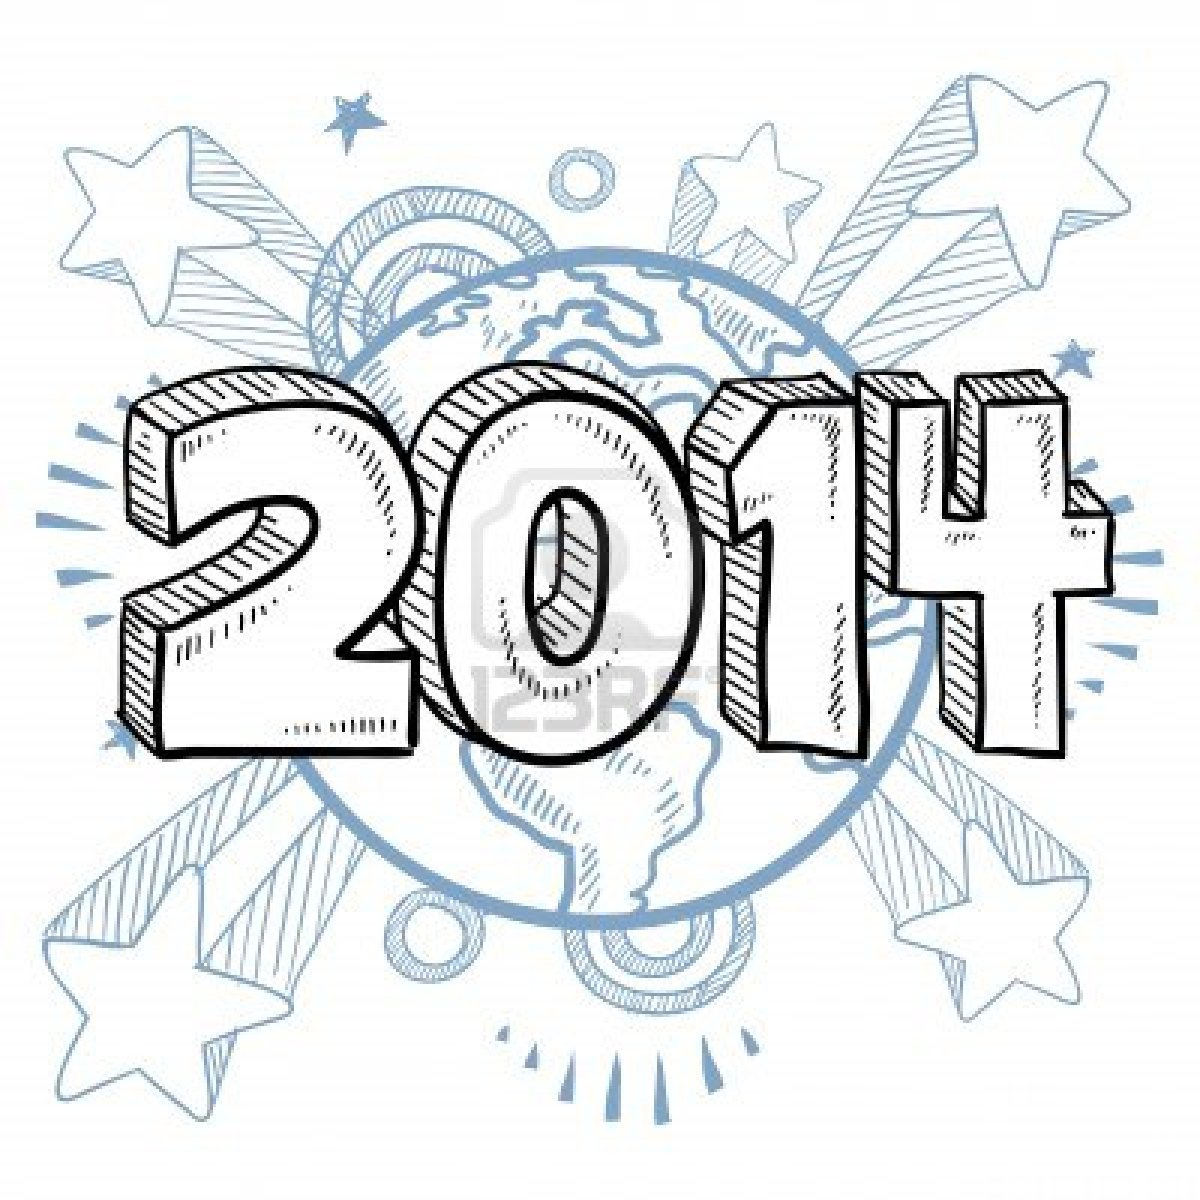 ������ ��� ����� 2014 , ��� ��� ����� ��������� 2014 , ��� ��� ��� ��� ����� 2014